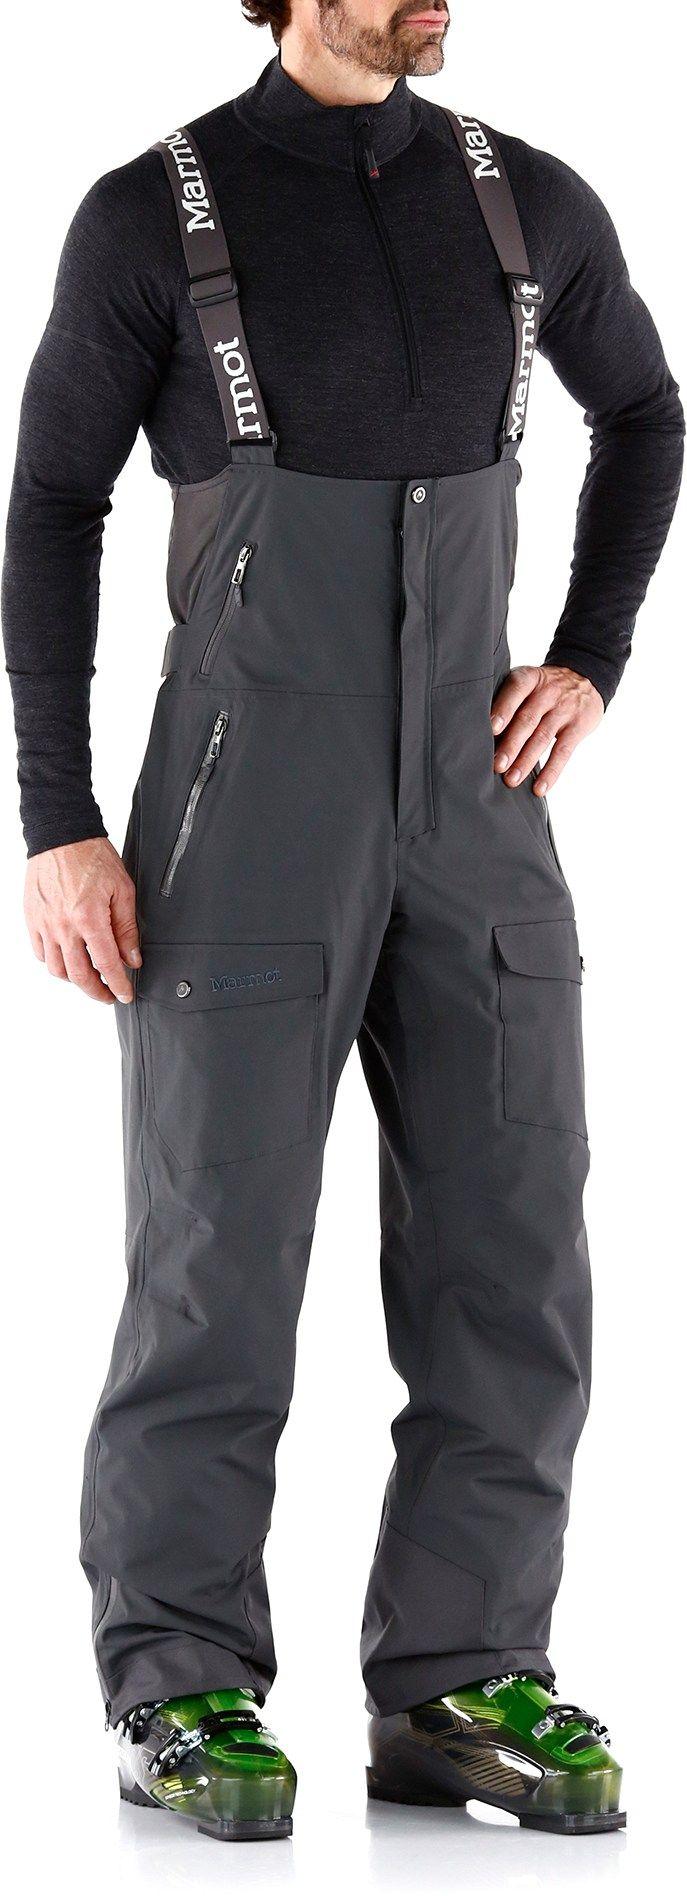 Marmot Male Rosco Bib Snow Pants - Men's